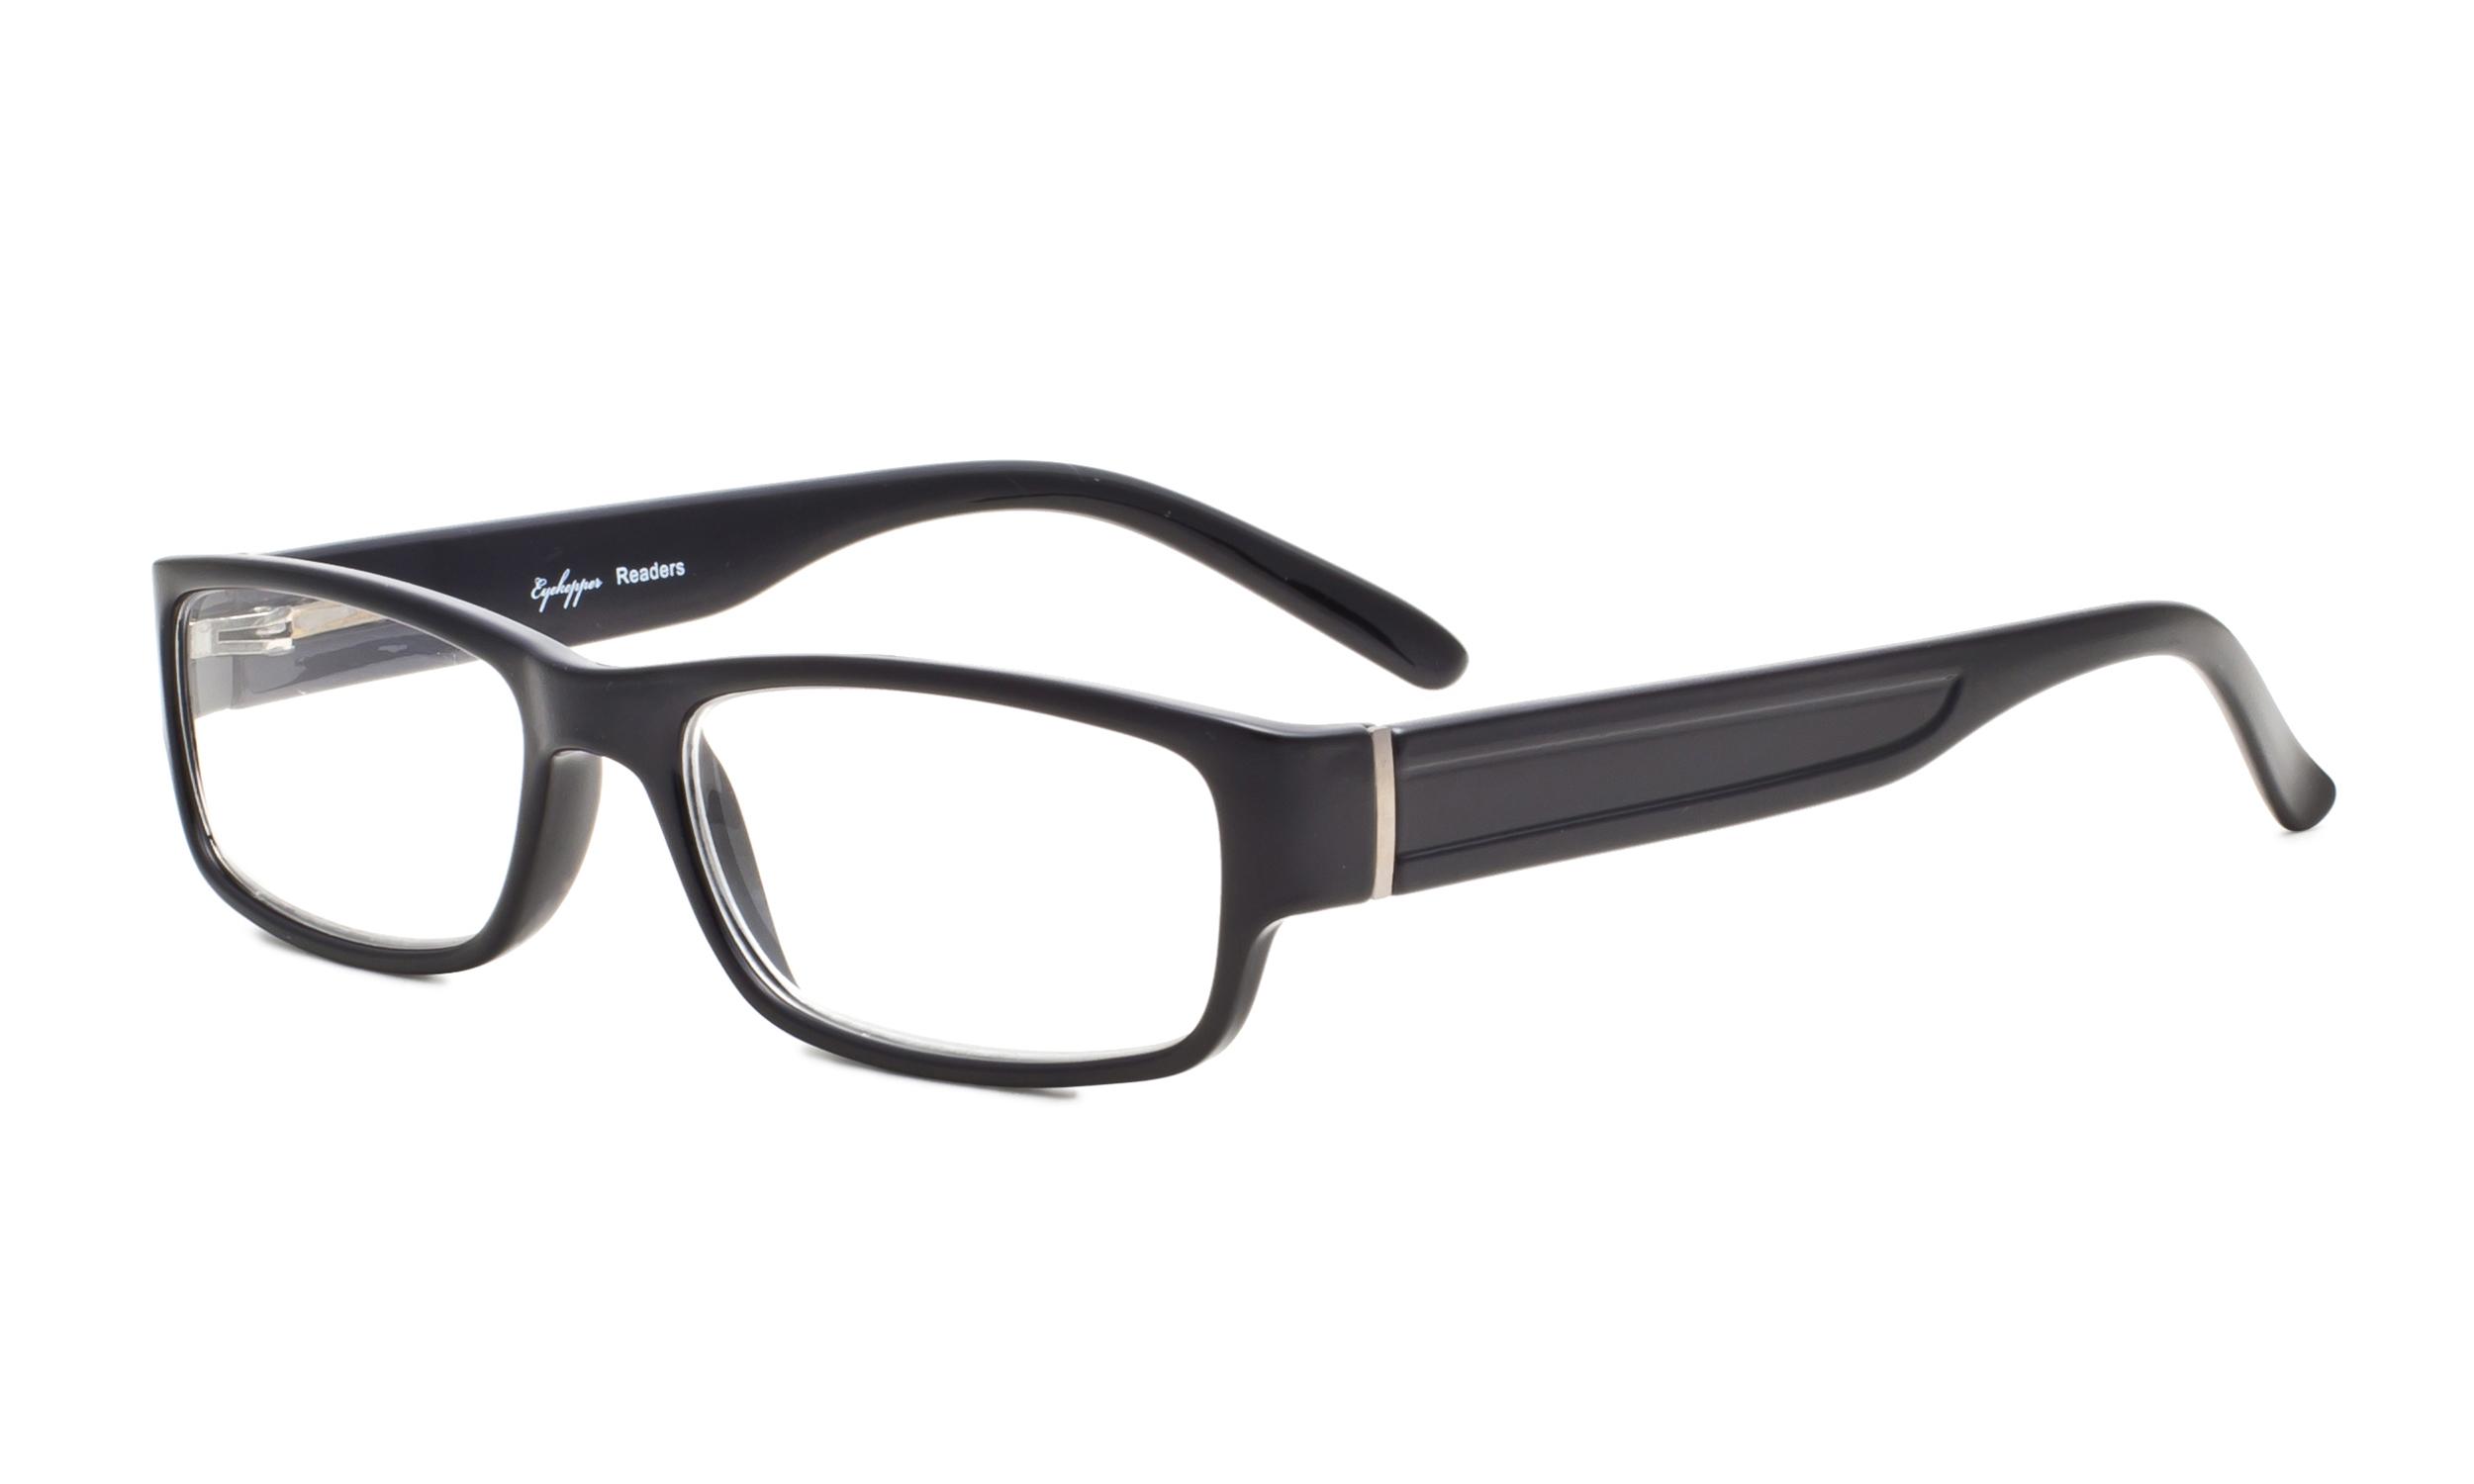 7238dc5e0dd9 Eyekepper Reading Glasses Classic Full Frame Design with Quality Spring- Hinges Temples Women Men Balck R092